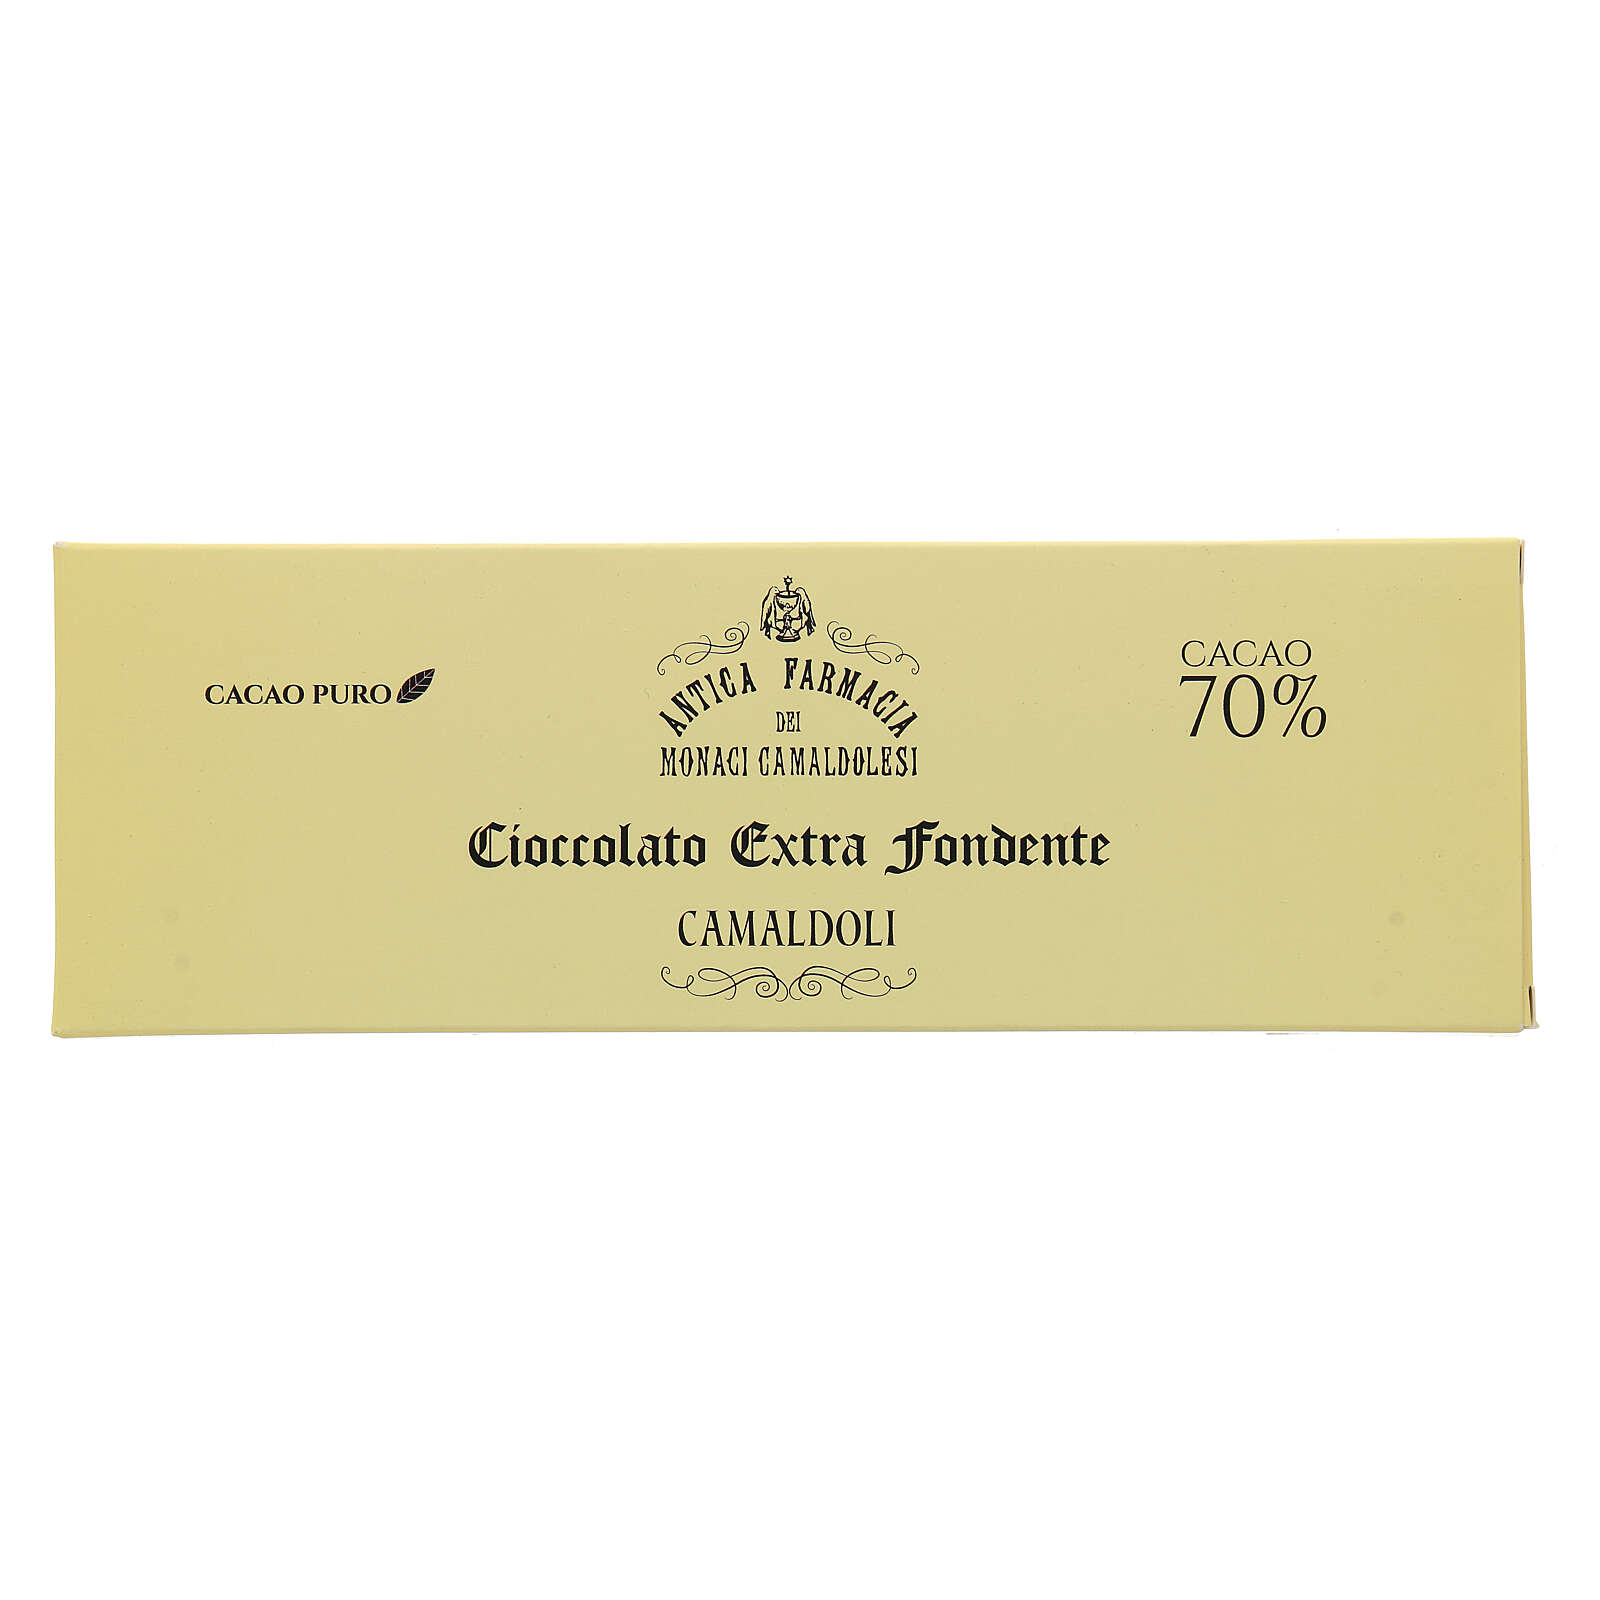 Extra fondente 70% gr 150 Camaldoli 3